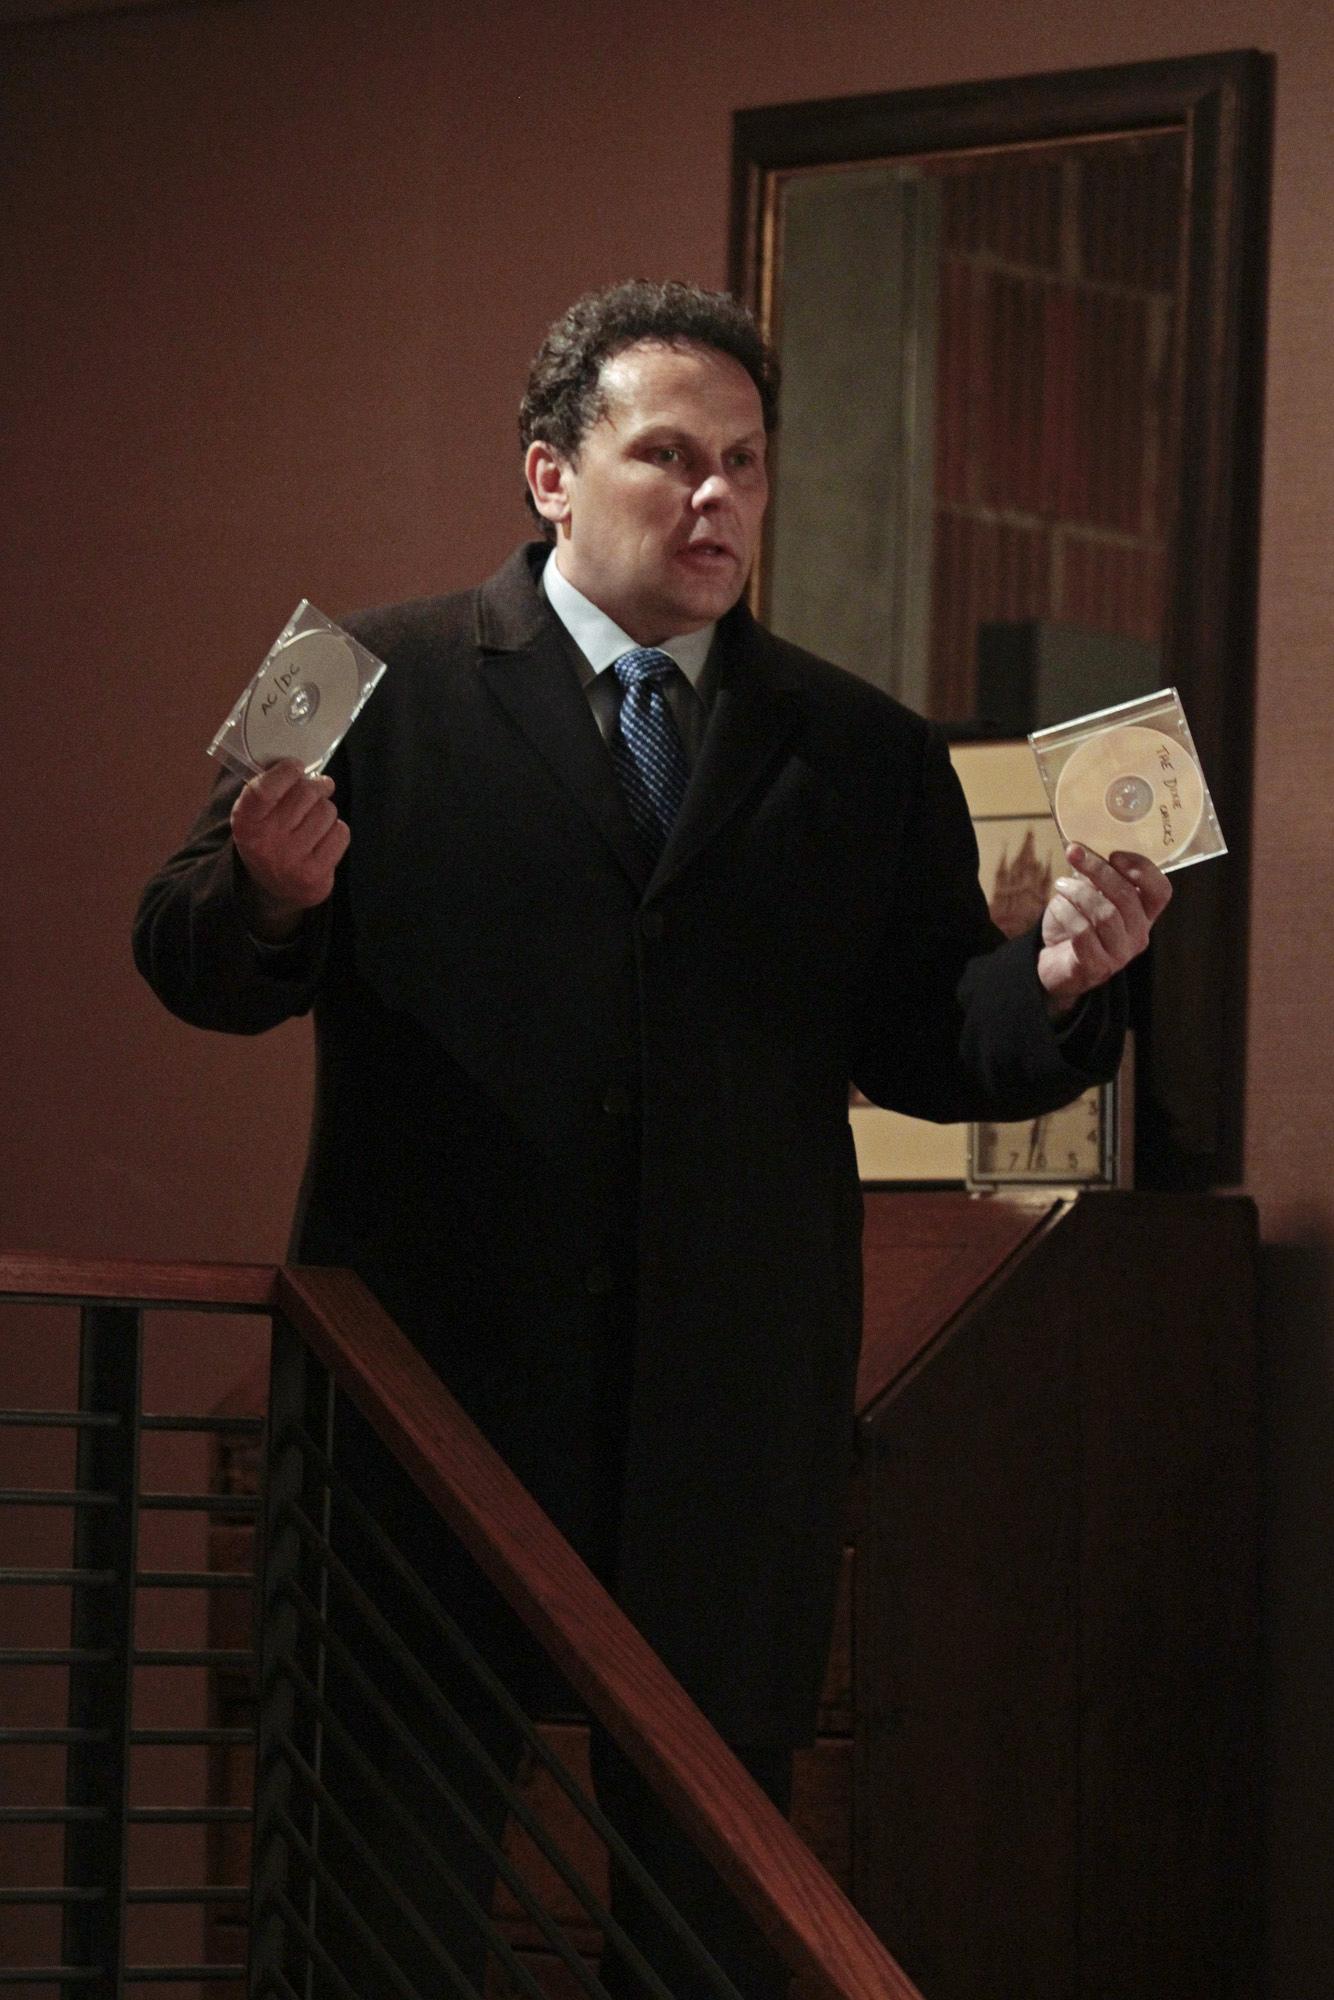 Season 3 Episode 19 - Person Of Interest - CBS.com